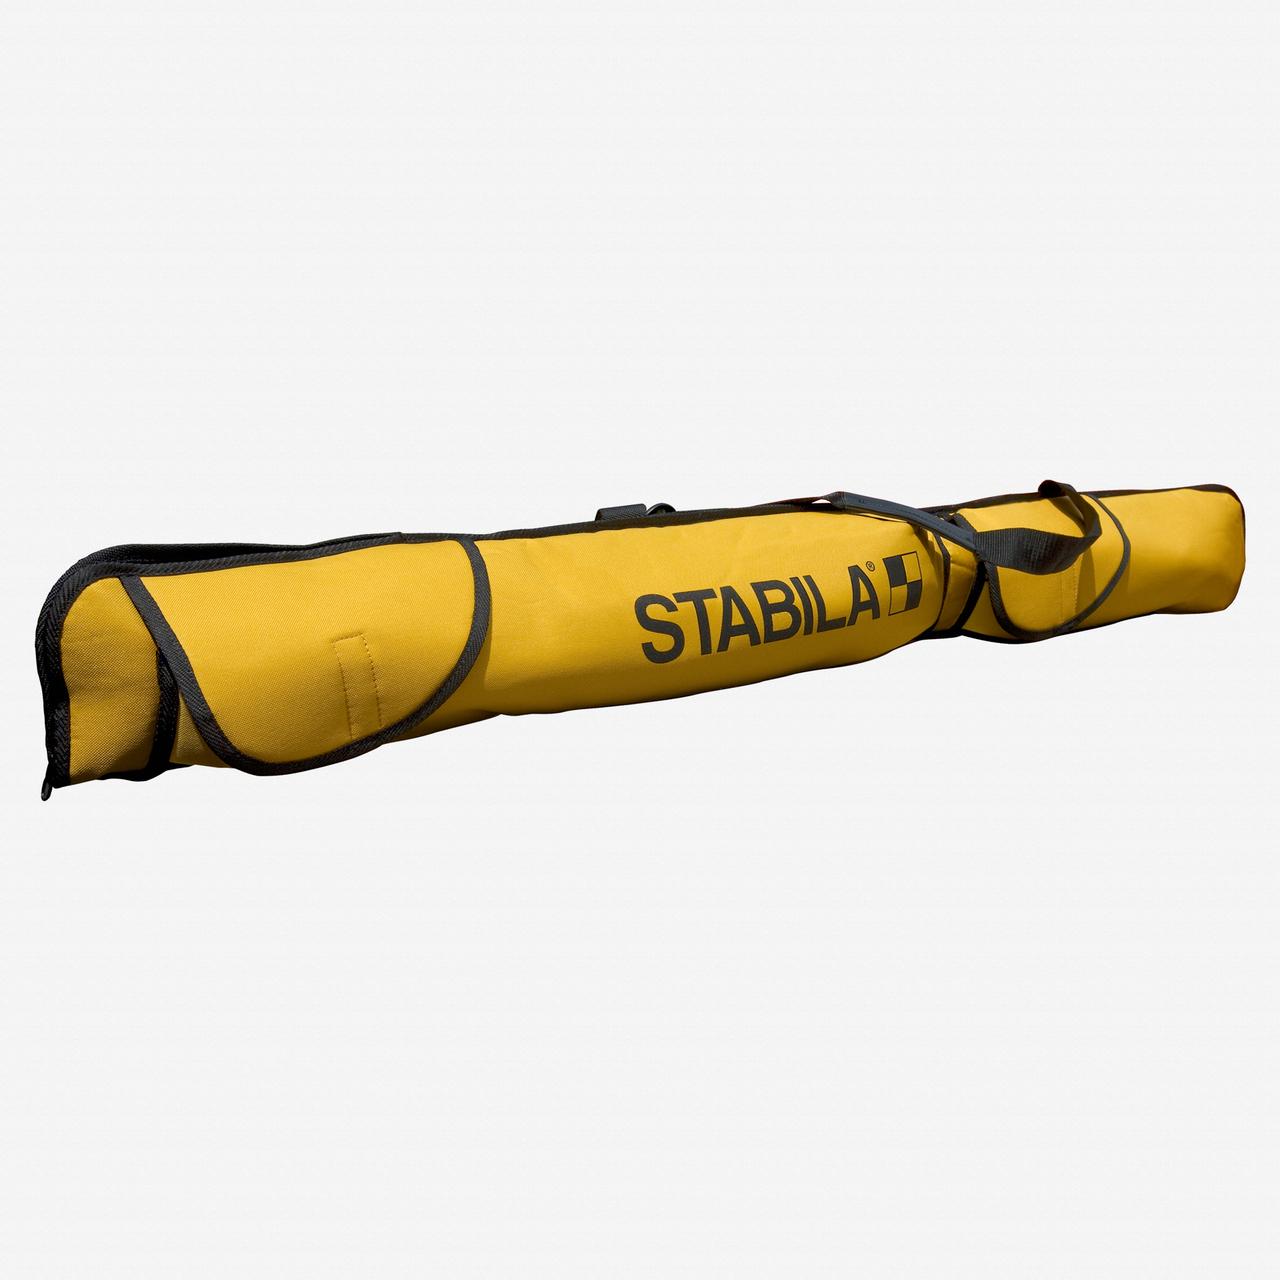 "Stabila 30059 Level Carrying Case, 59"" long - KC Tool"